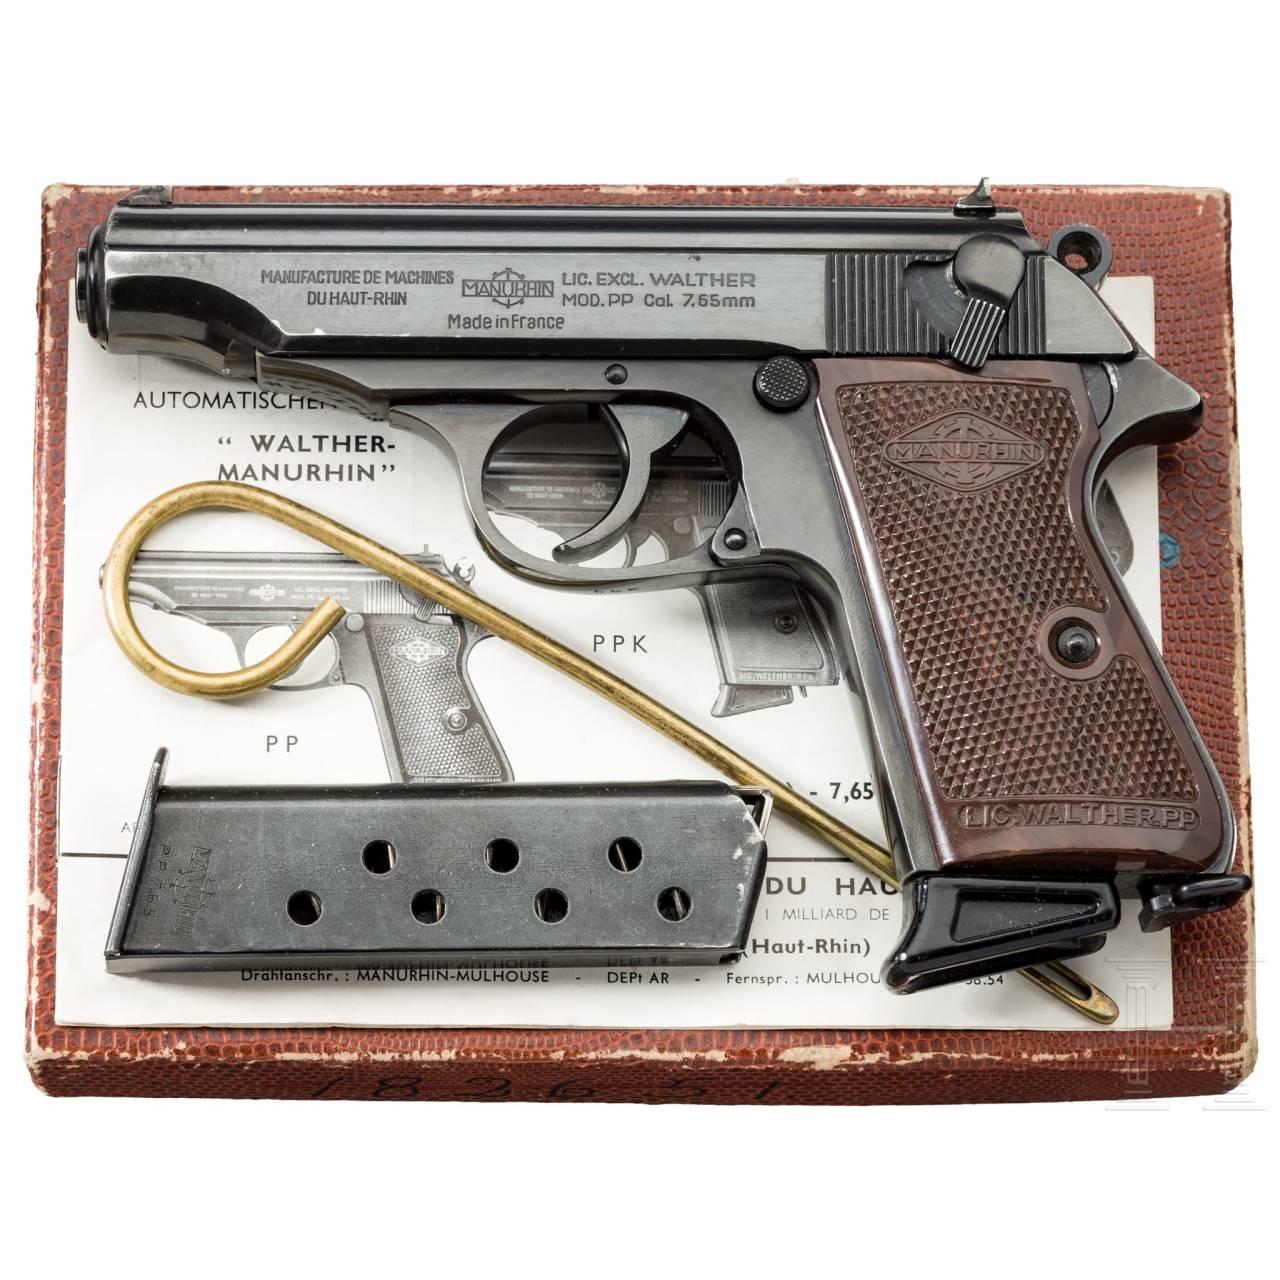 Walther-Manurhin PP, im Karton, Behörde